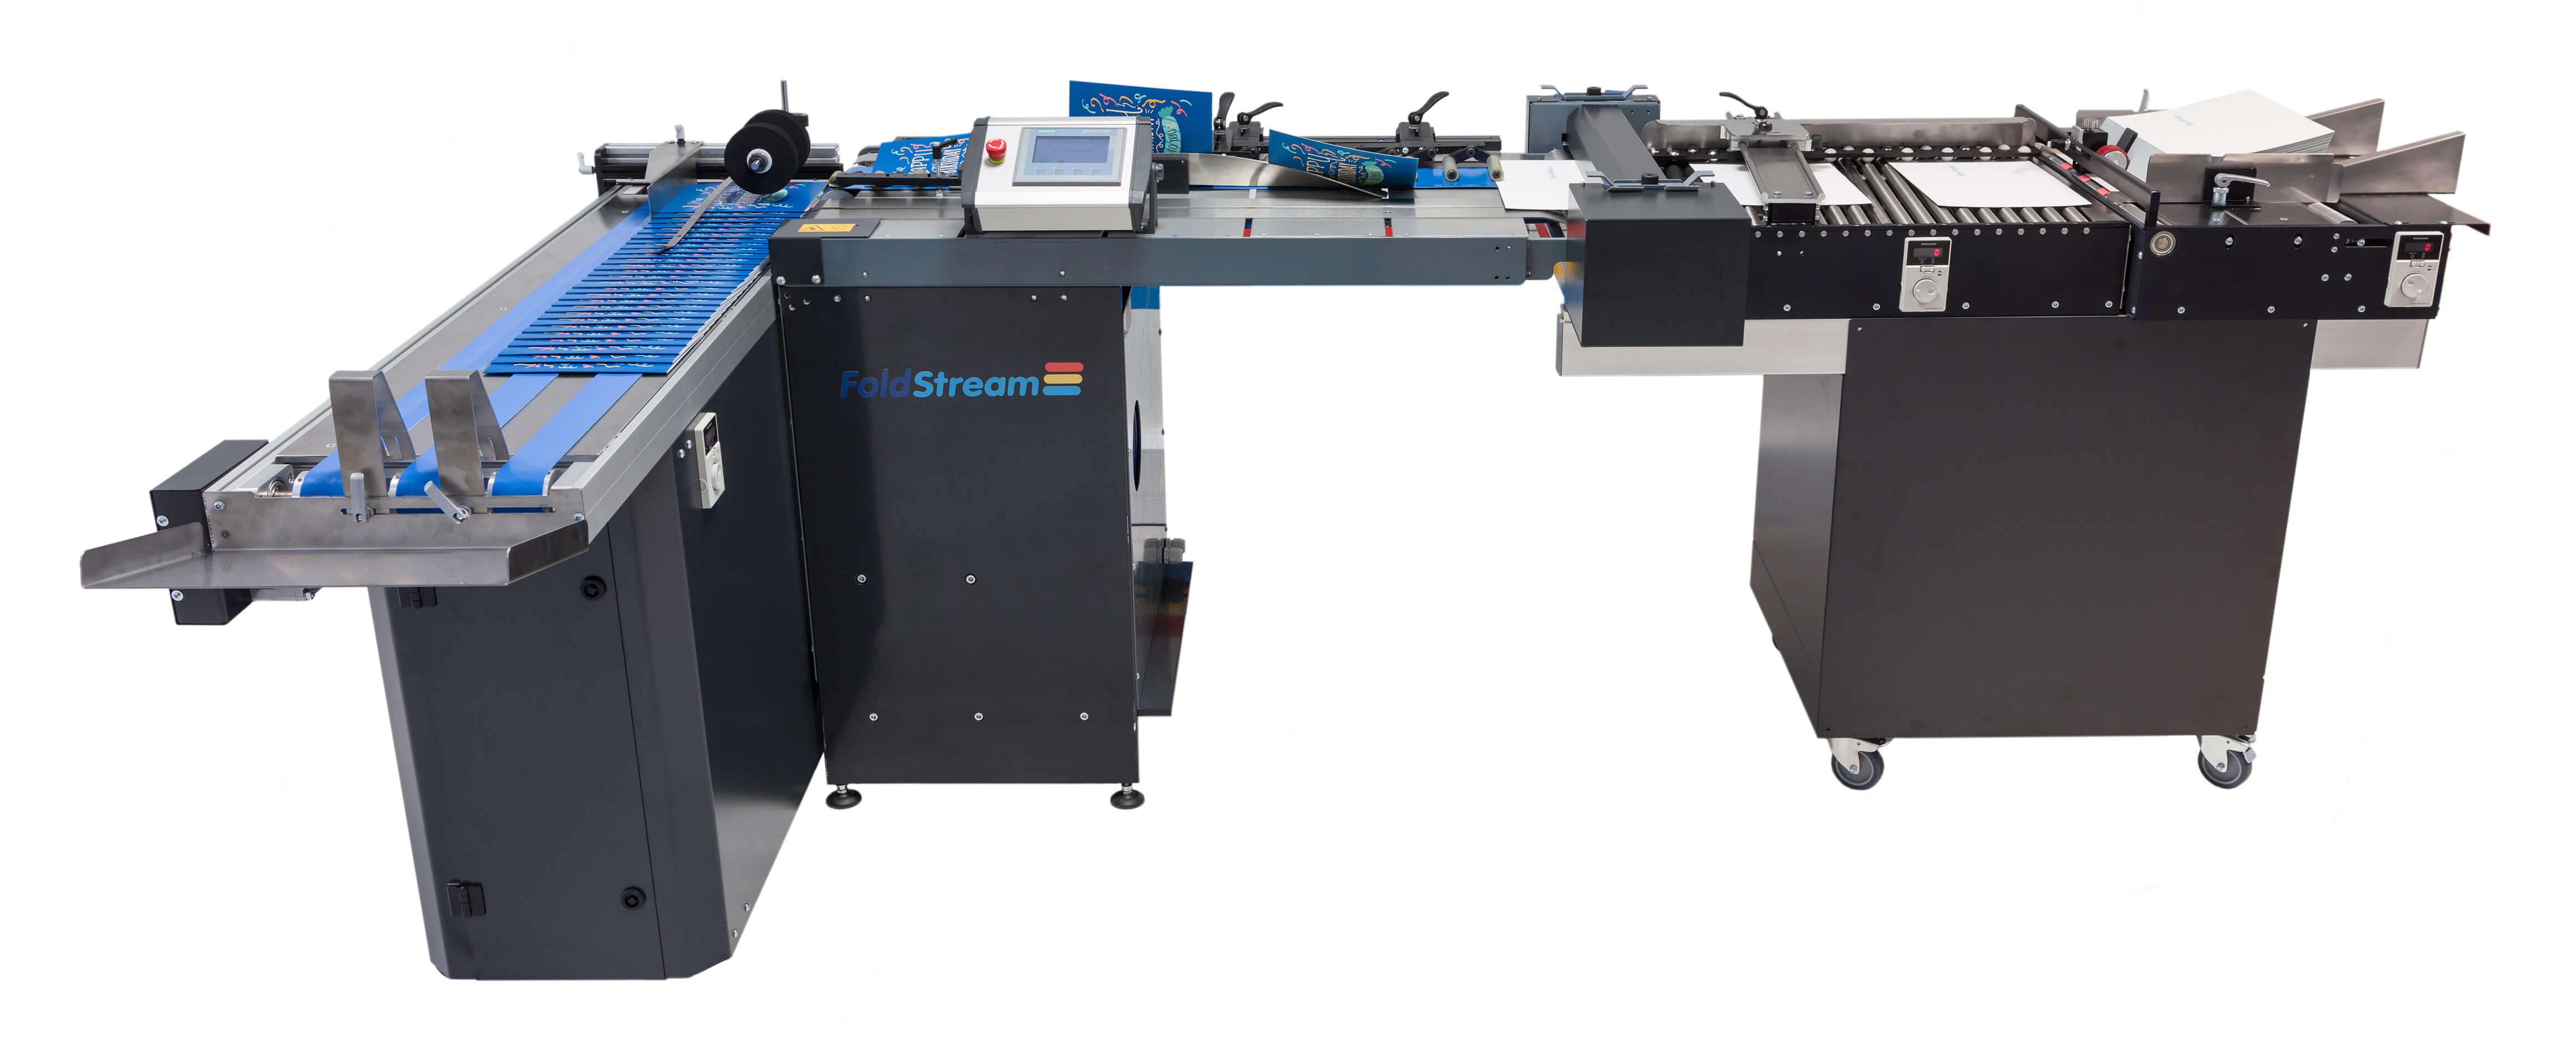 CreaseStream Foldstream digital crease and fold machine